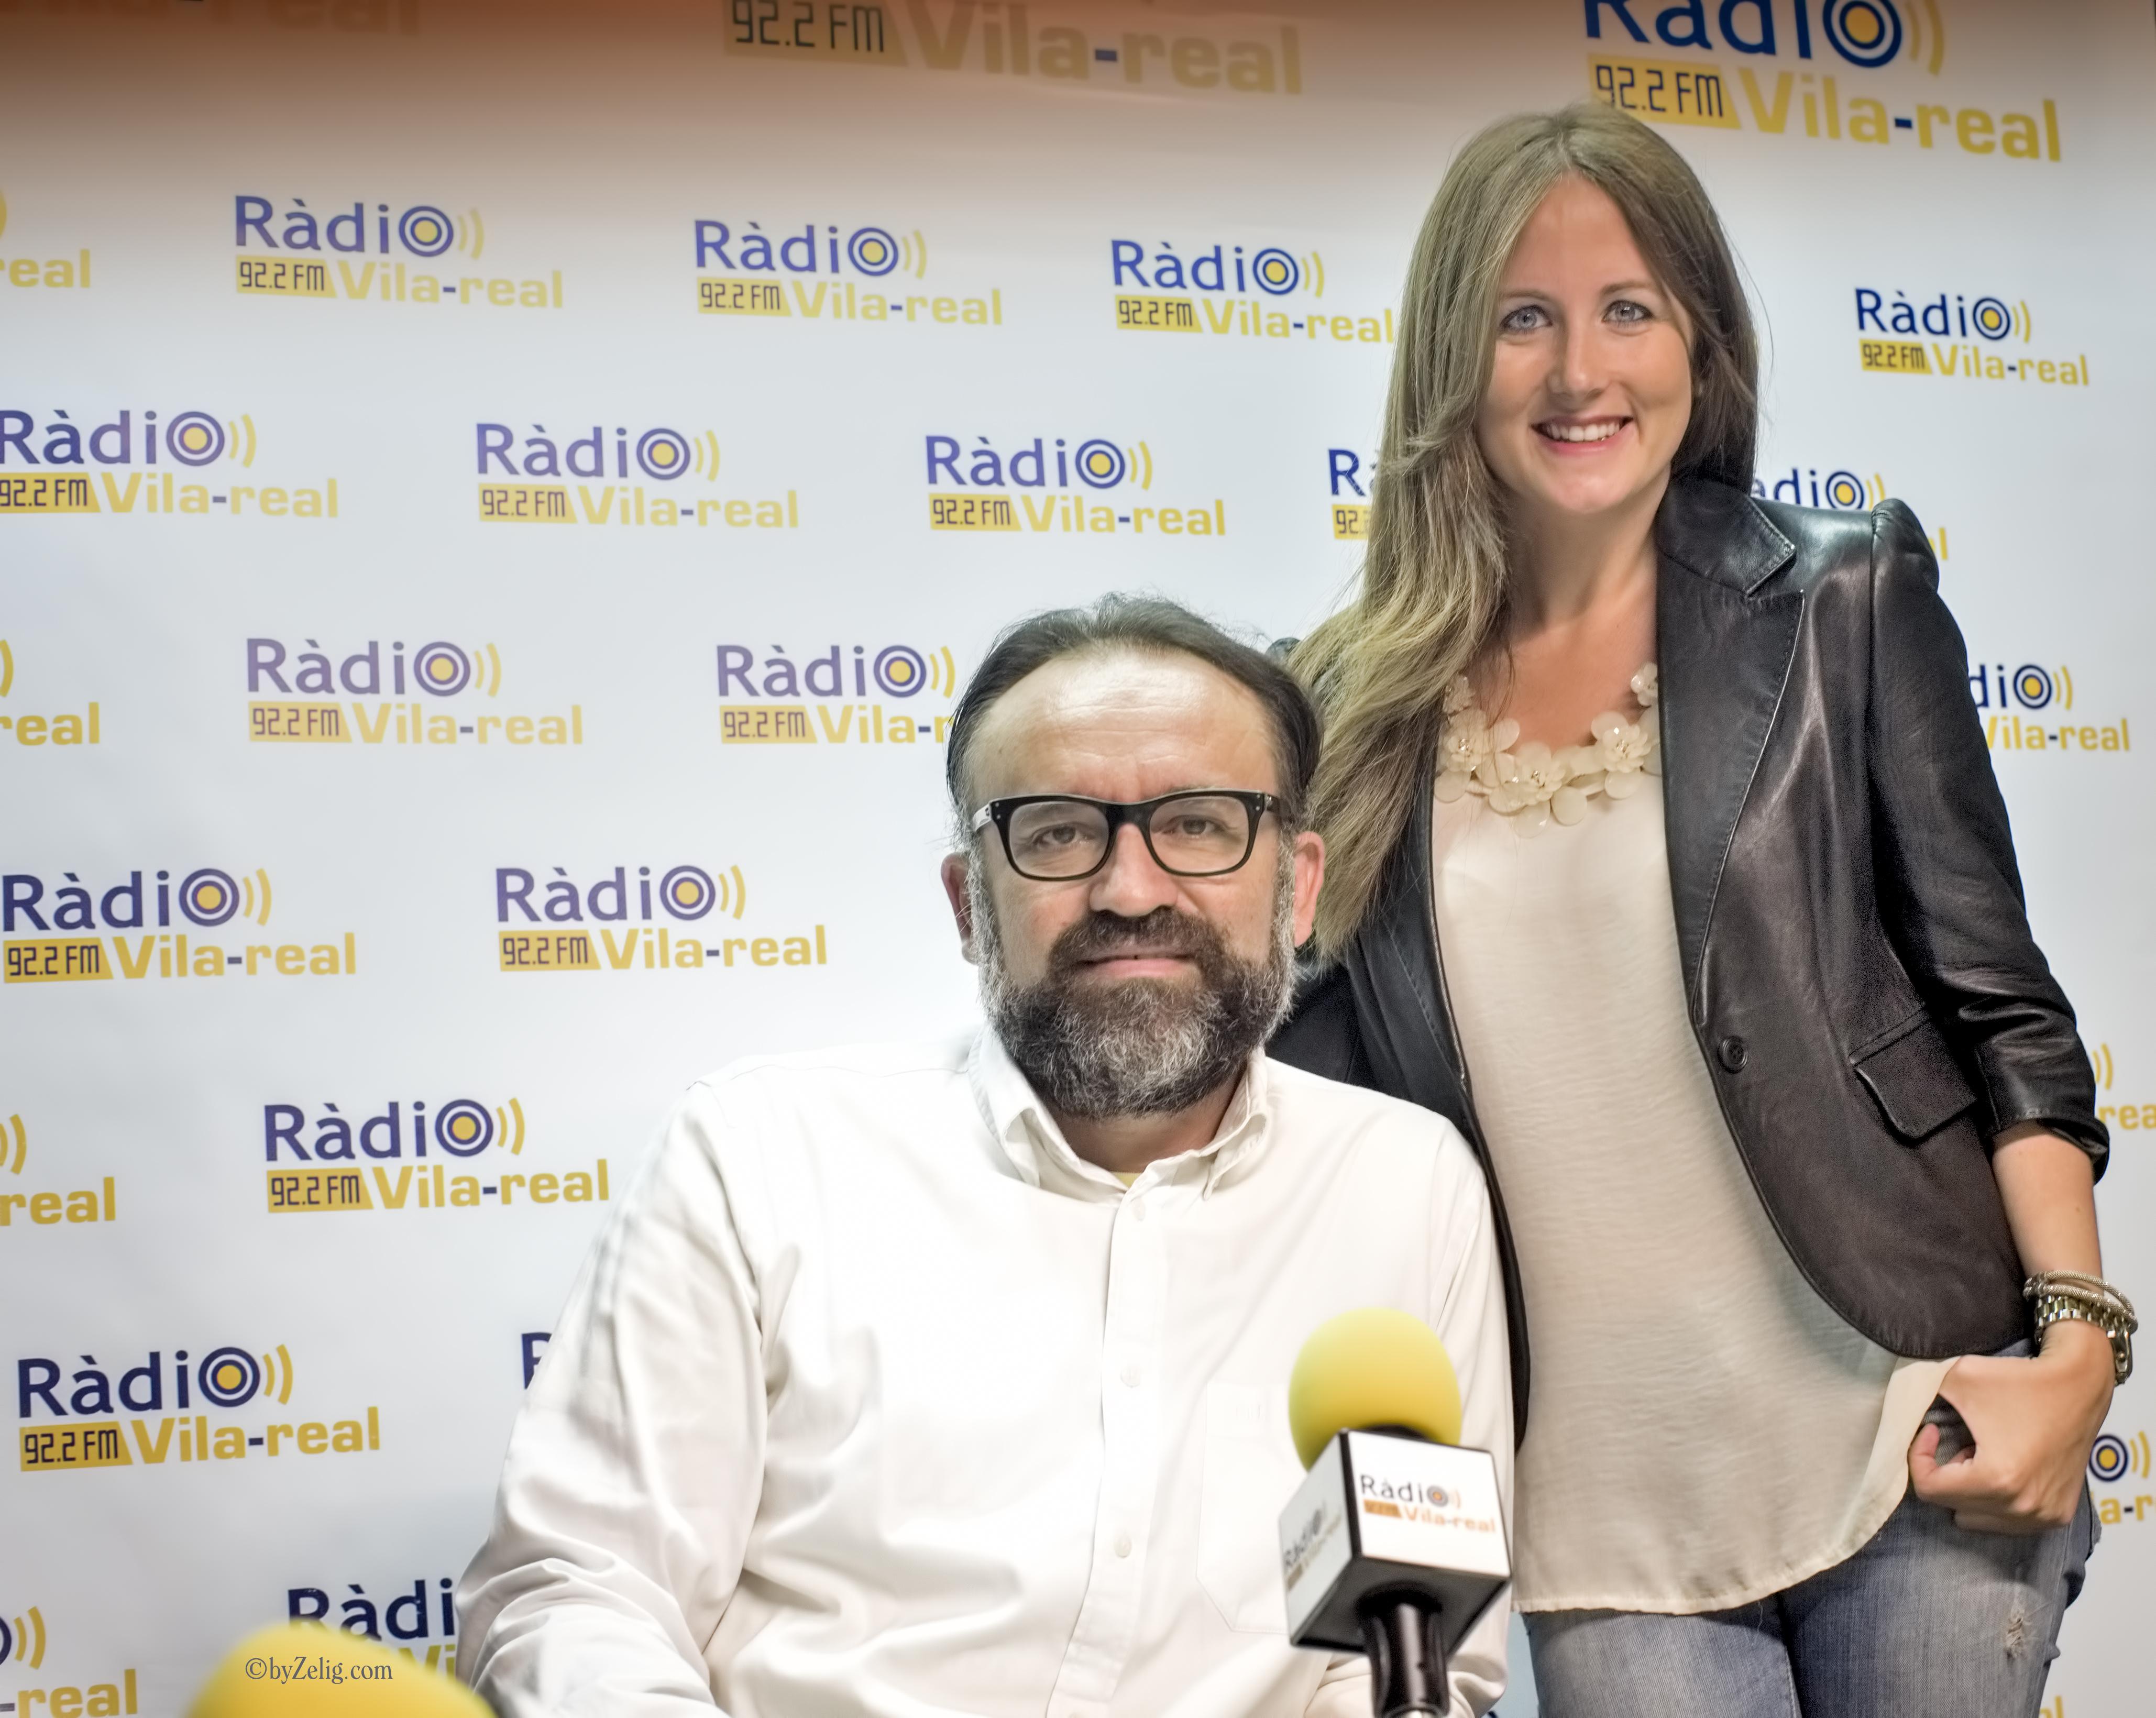 Esports Radio Vila-real. Programa del 4 de diciembre 2017